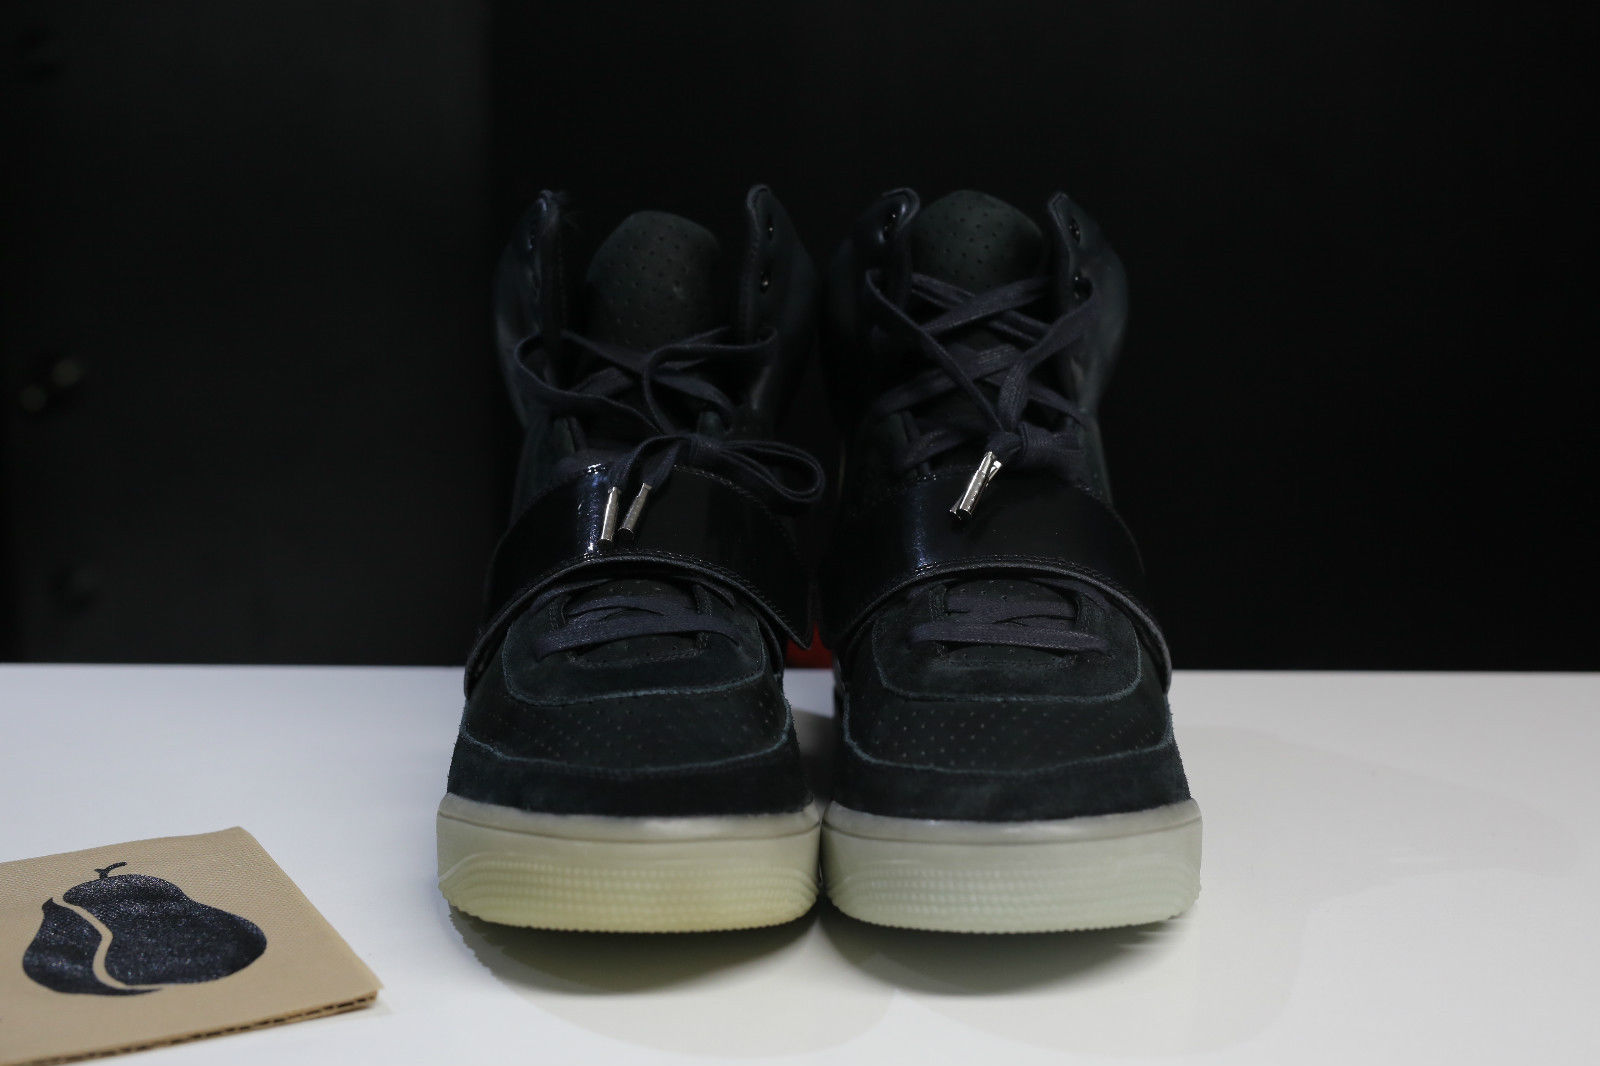 bf97d8671ebdf Nike Air Yeezy Kanye West Black White Sample Pair Toe